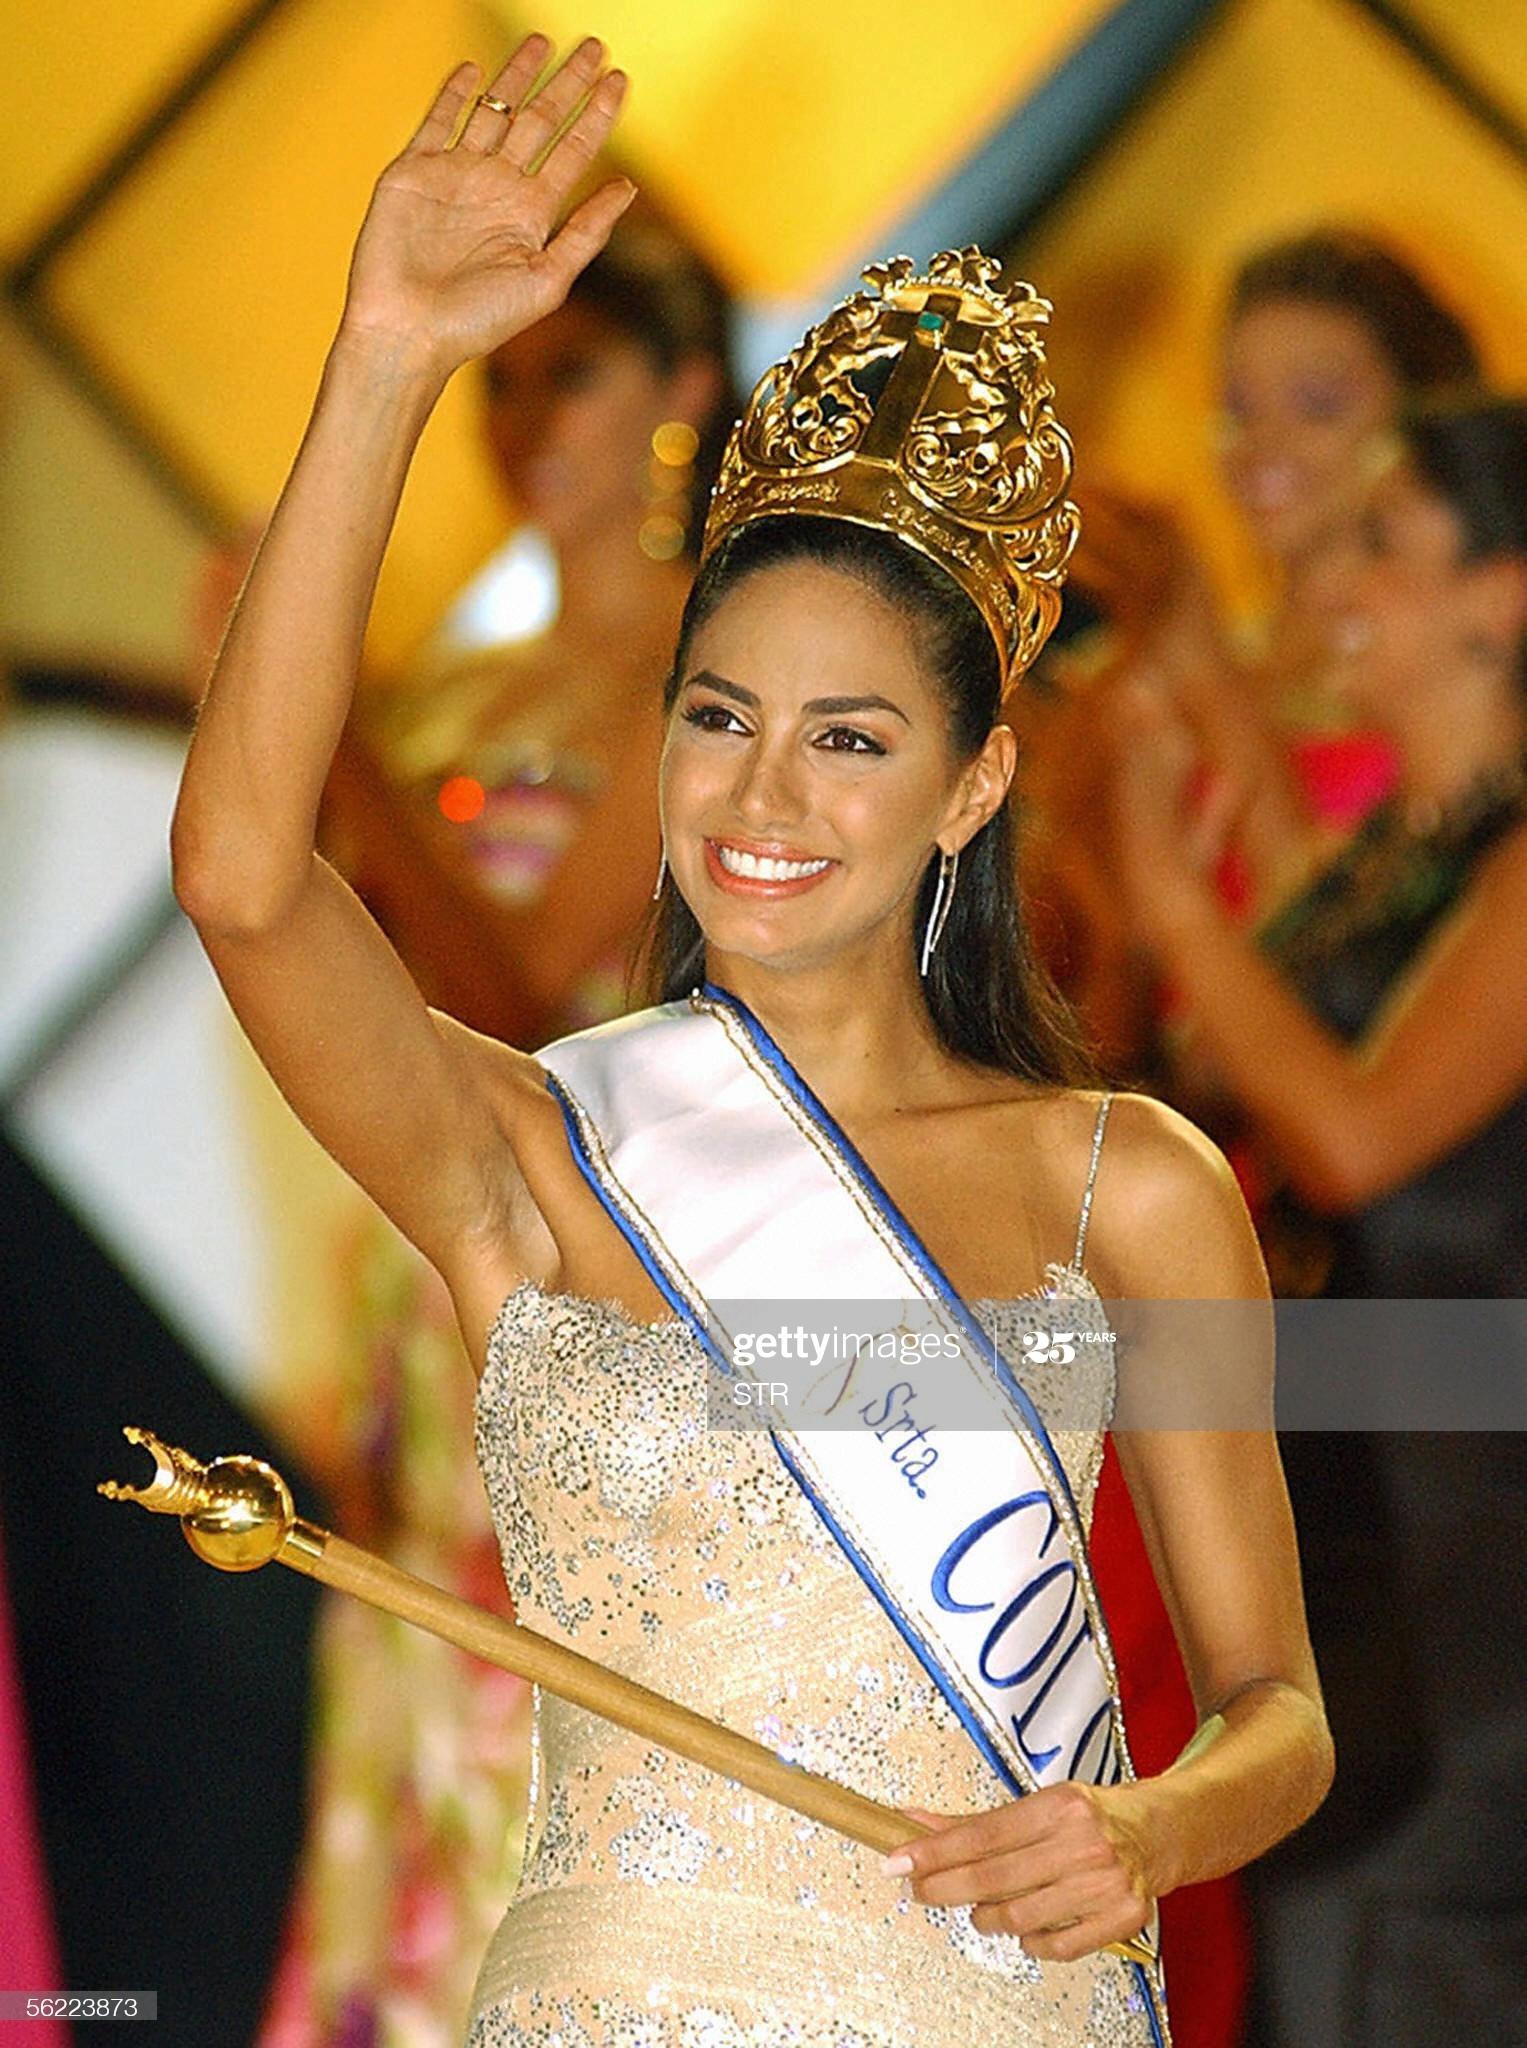 valerie dominguez, top 10 de miss universe 2006. Valeri30